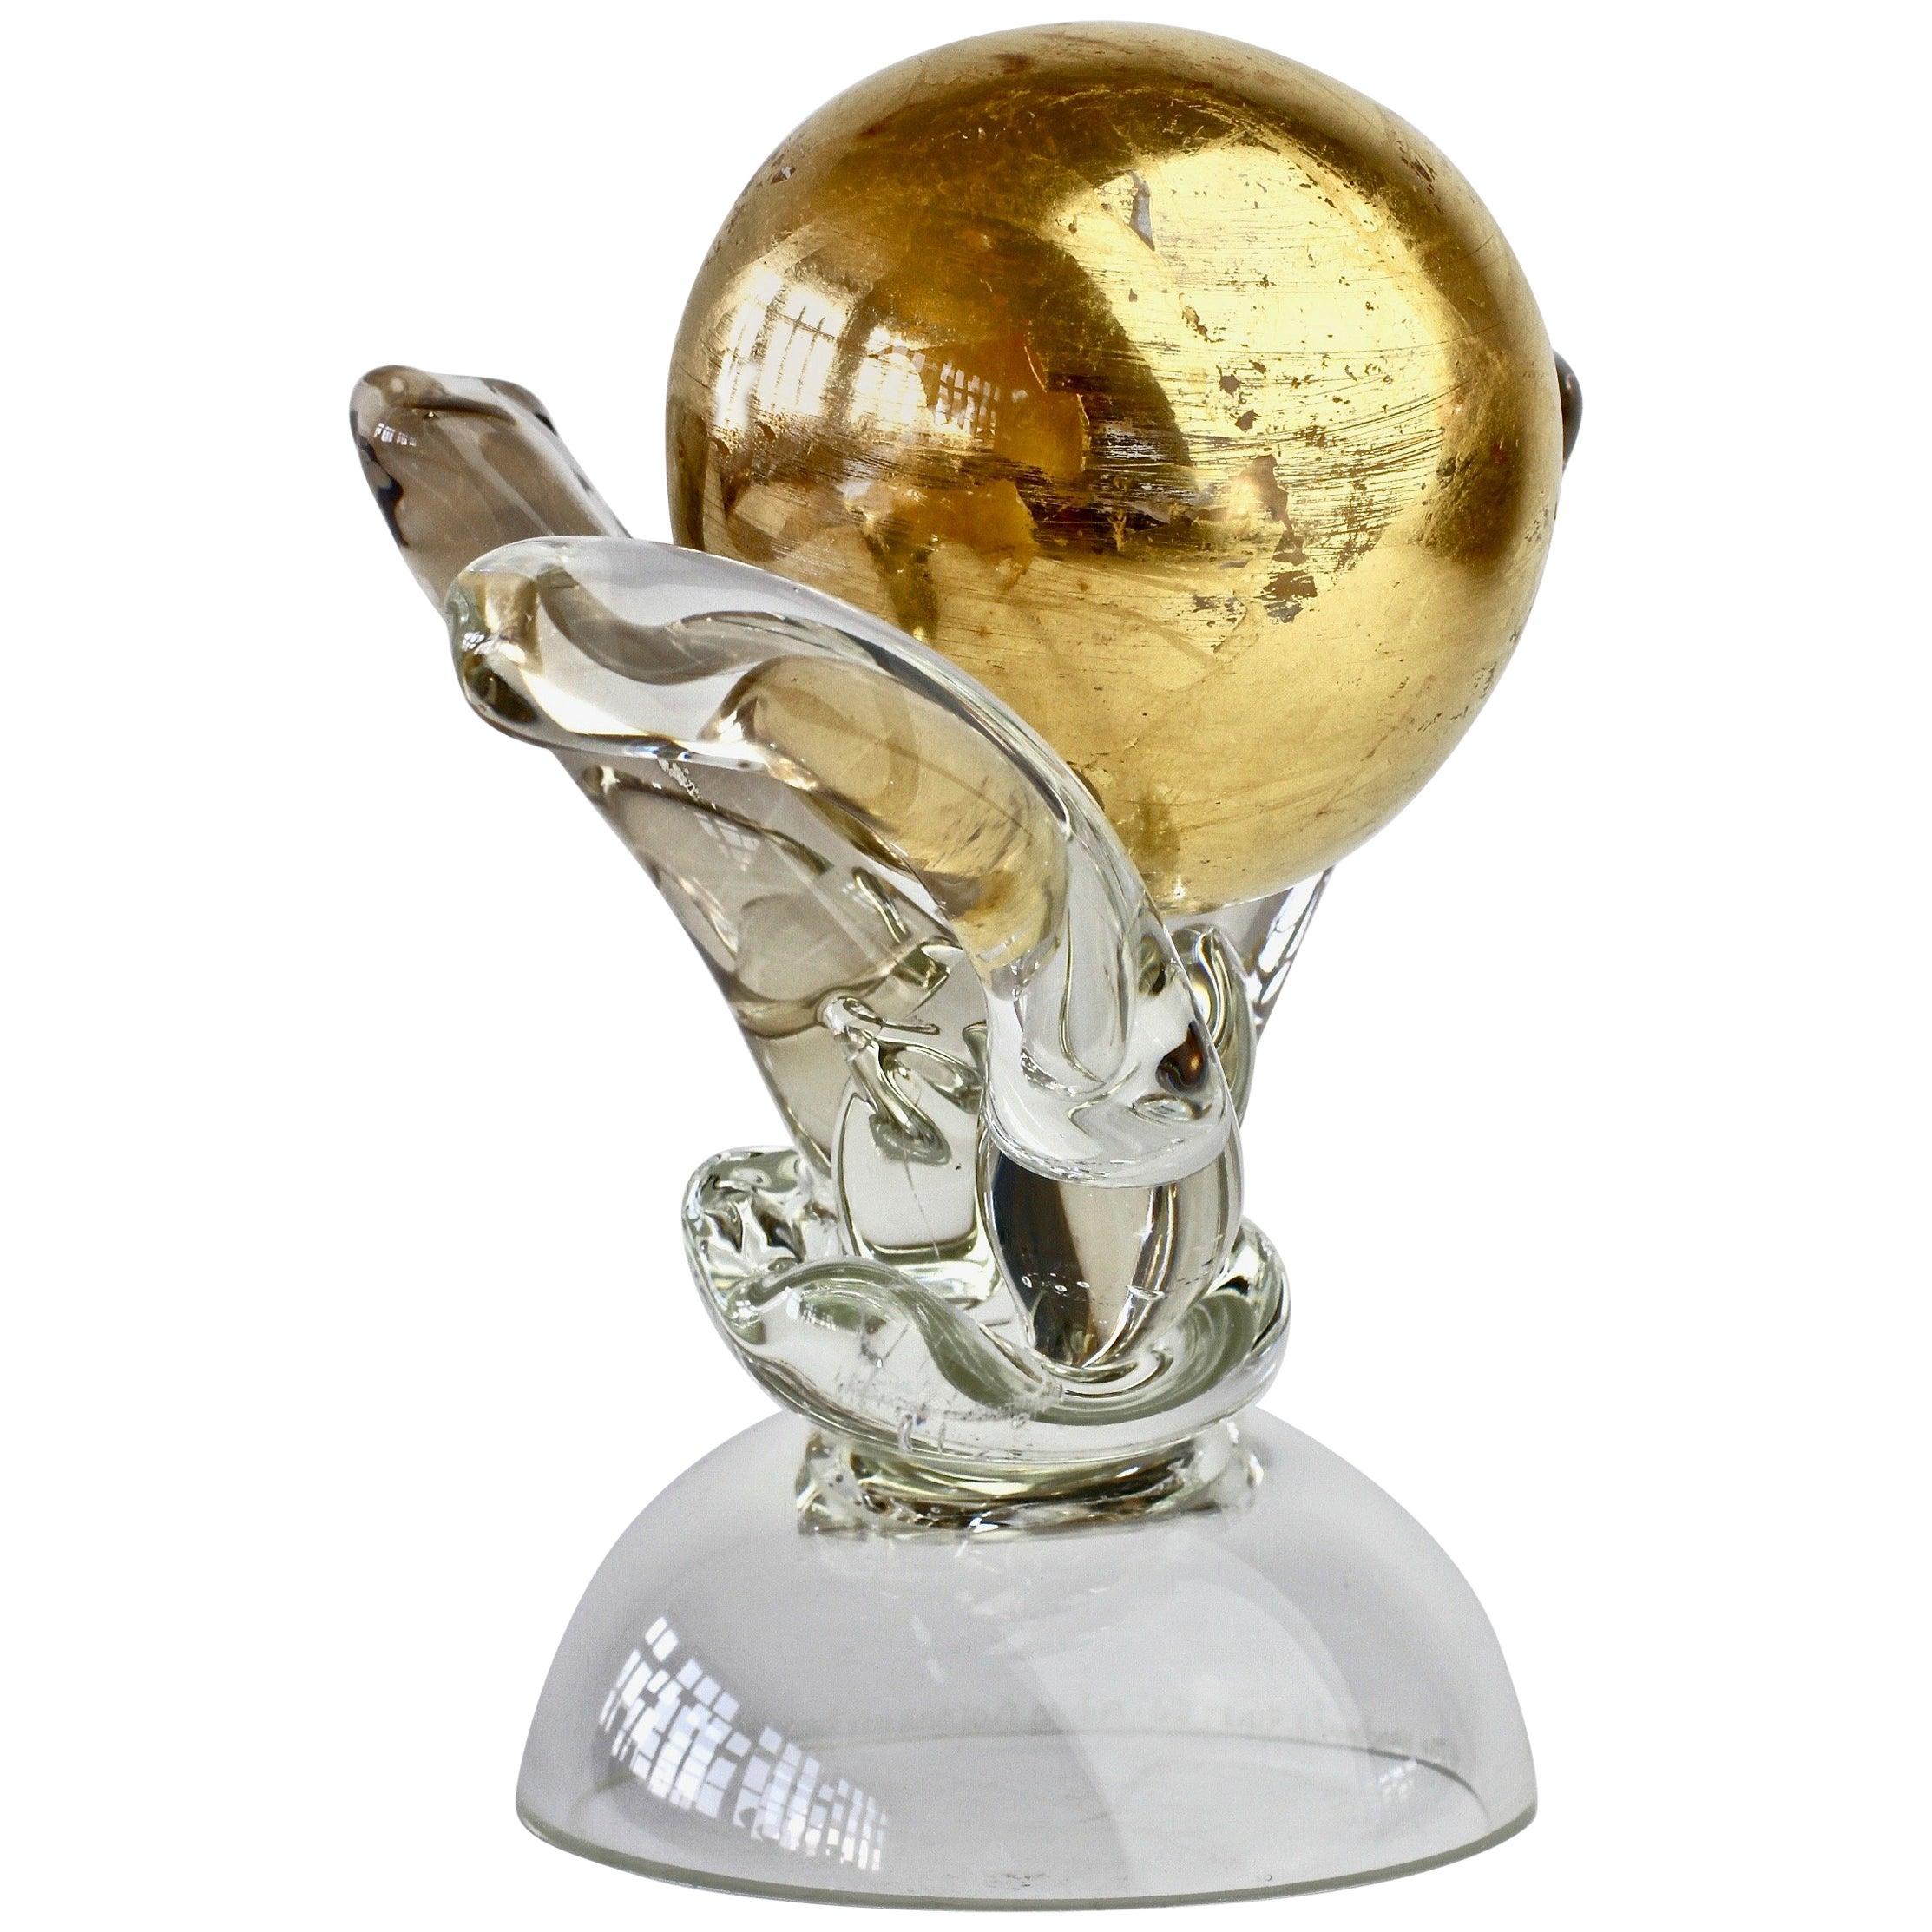 British Studio Art Glass 'Golden Globe' Sculpture signed by Adam Aaronson, 1997